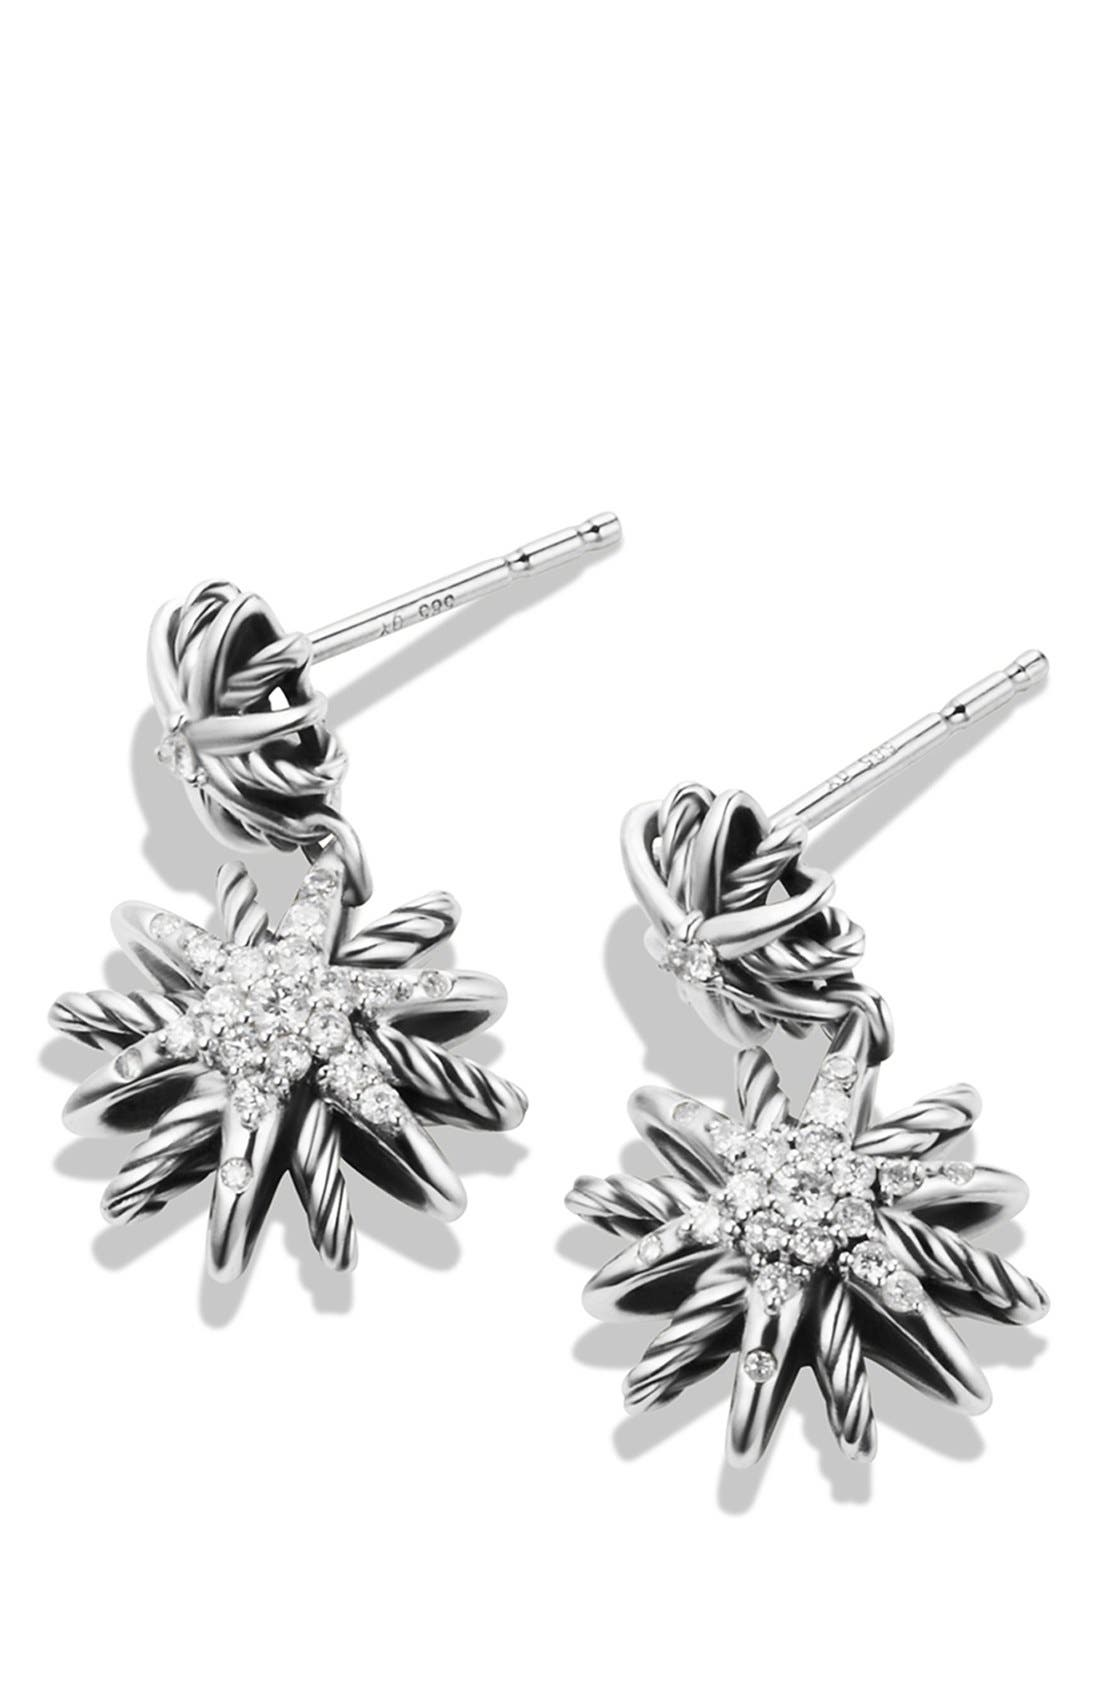 Alternate Image 2  - David Yurman 'Starburst' Double-Drop Earrings with Diamonds